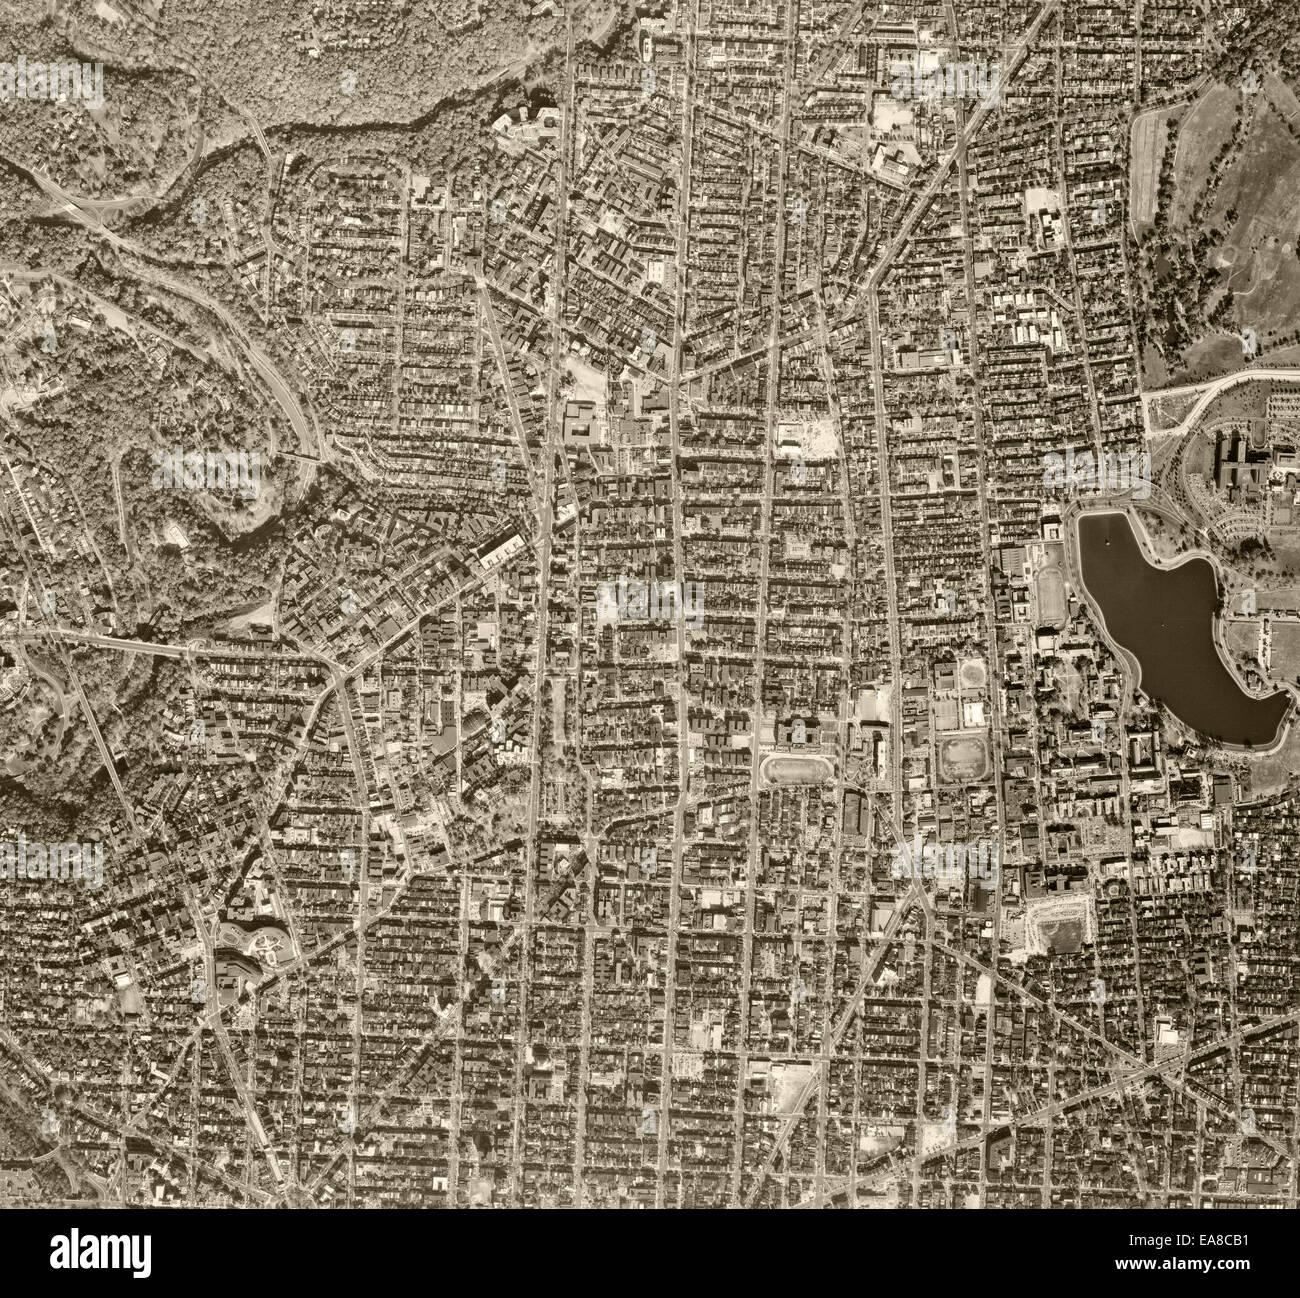 historical aerial photograph of Washington, DC, 1968 - Stock Image